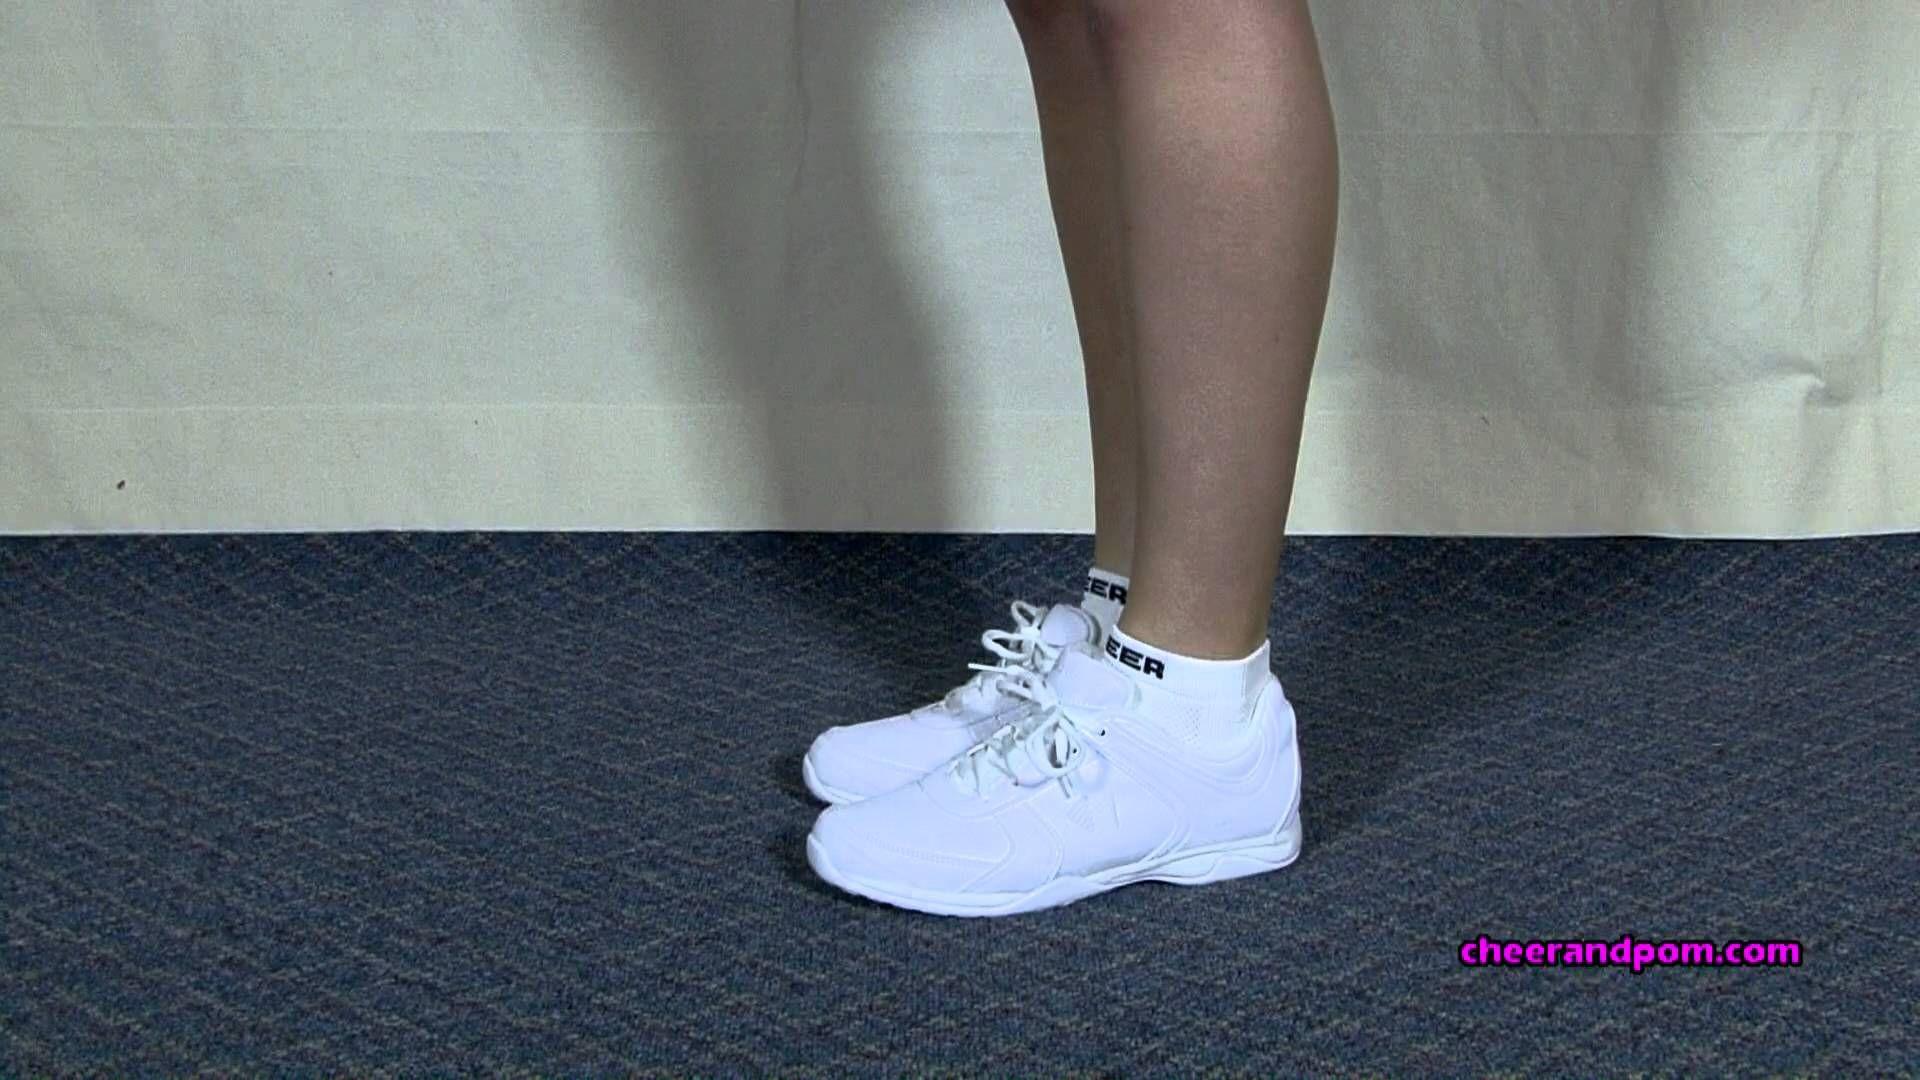 b4965078c20 Kaepa Spark Cheer Shoe Review.